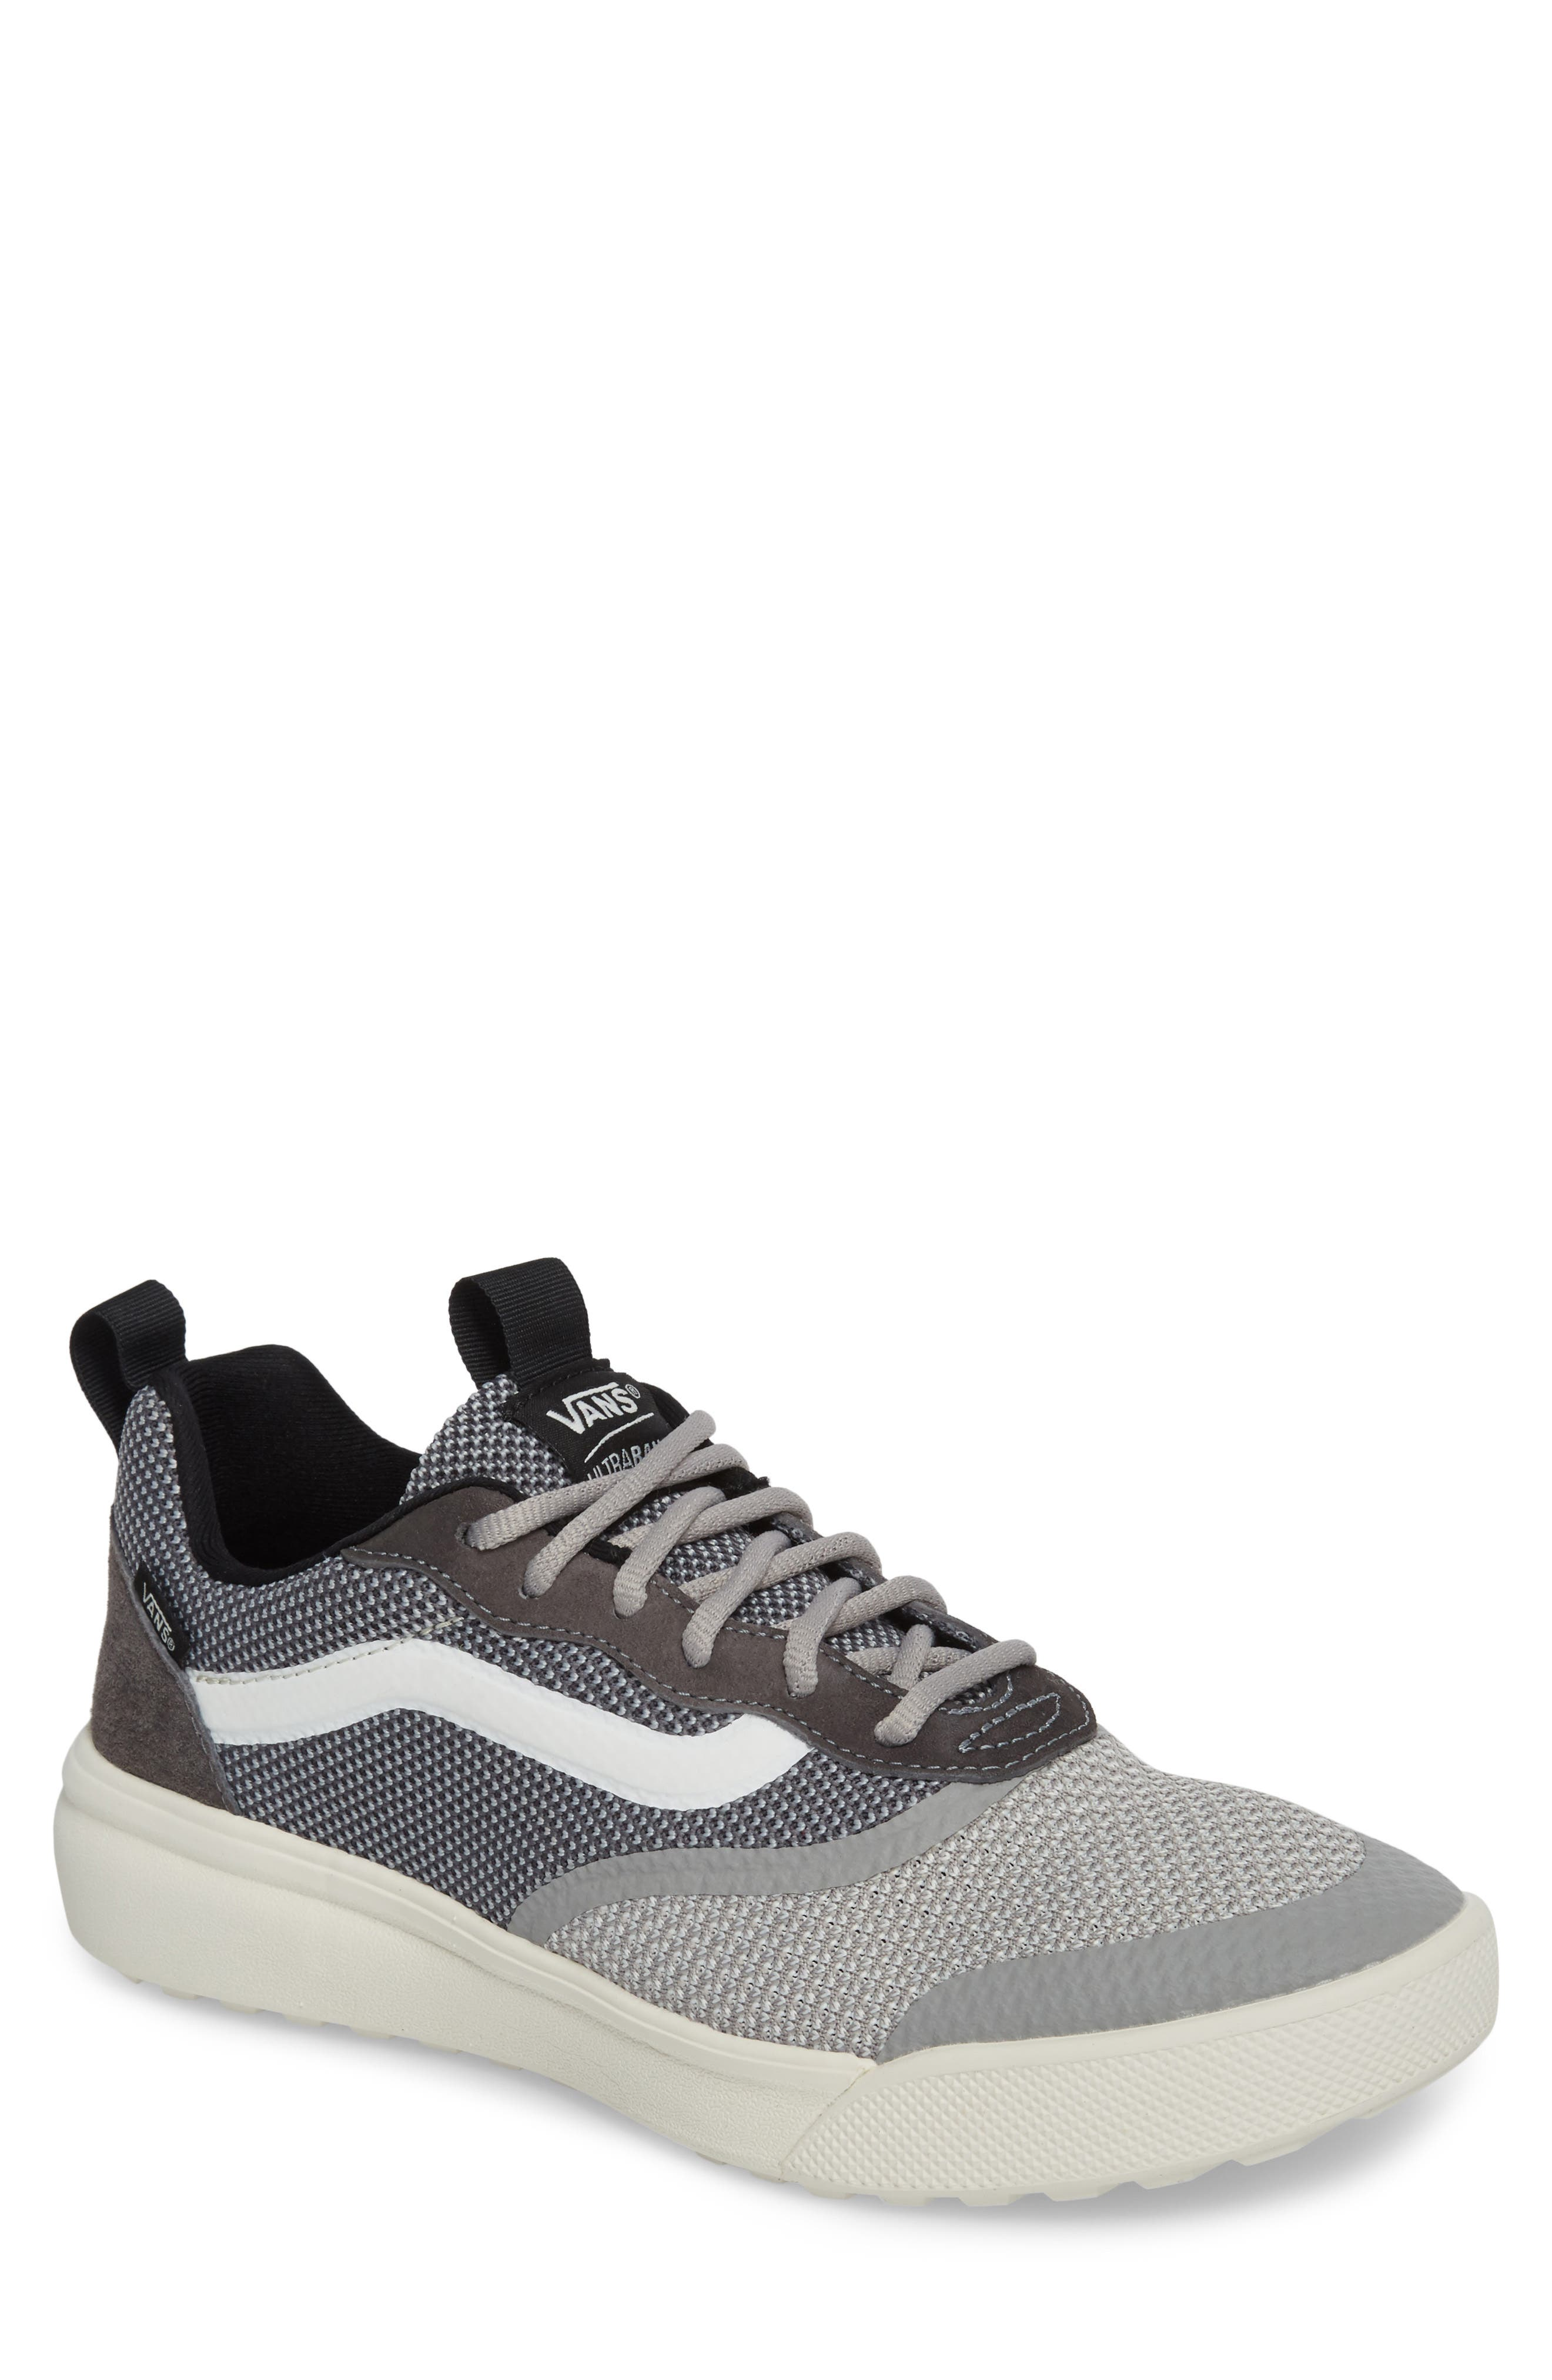 UltraRange DX Low Top Sneaker,                         Main,                         color,